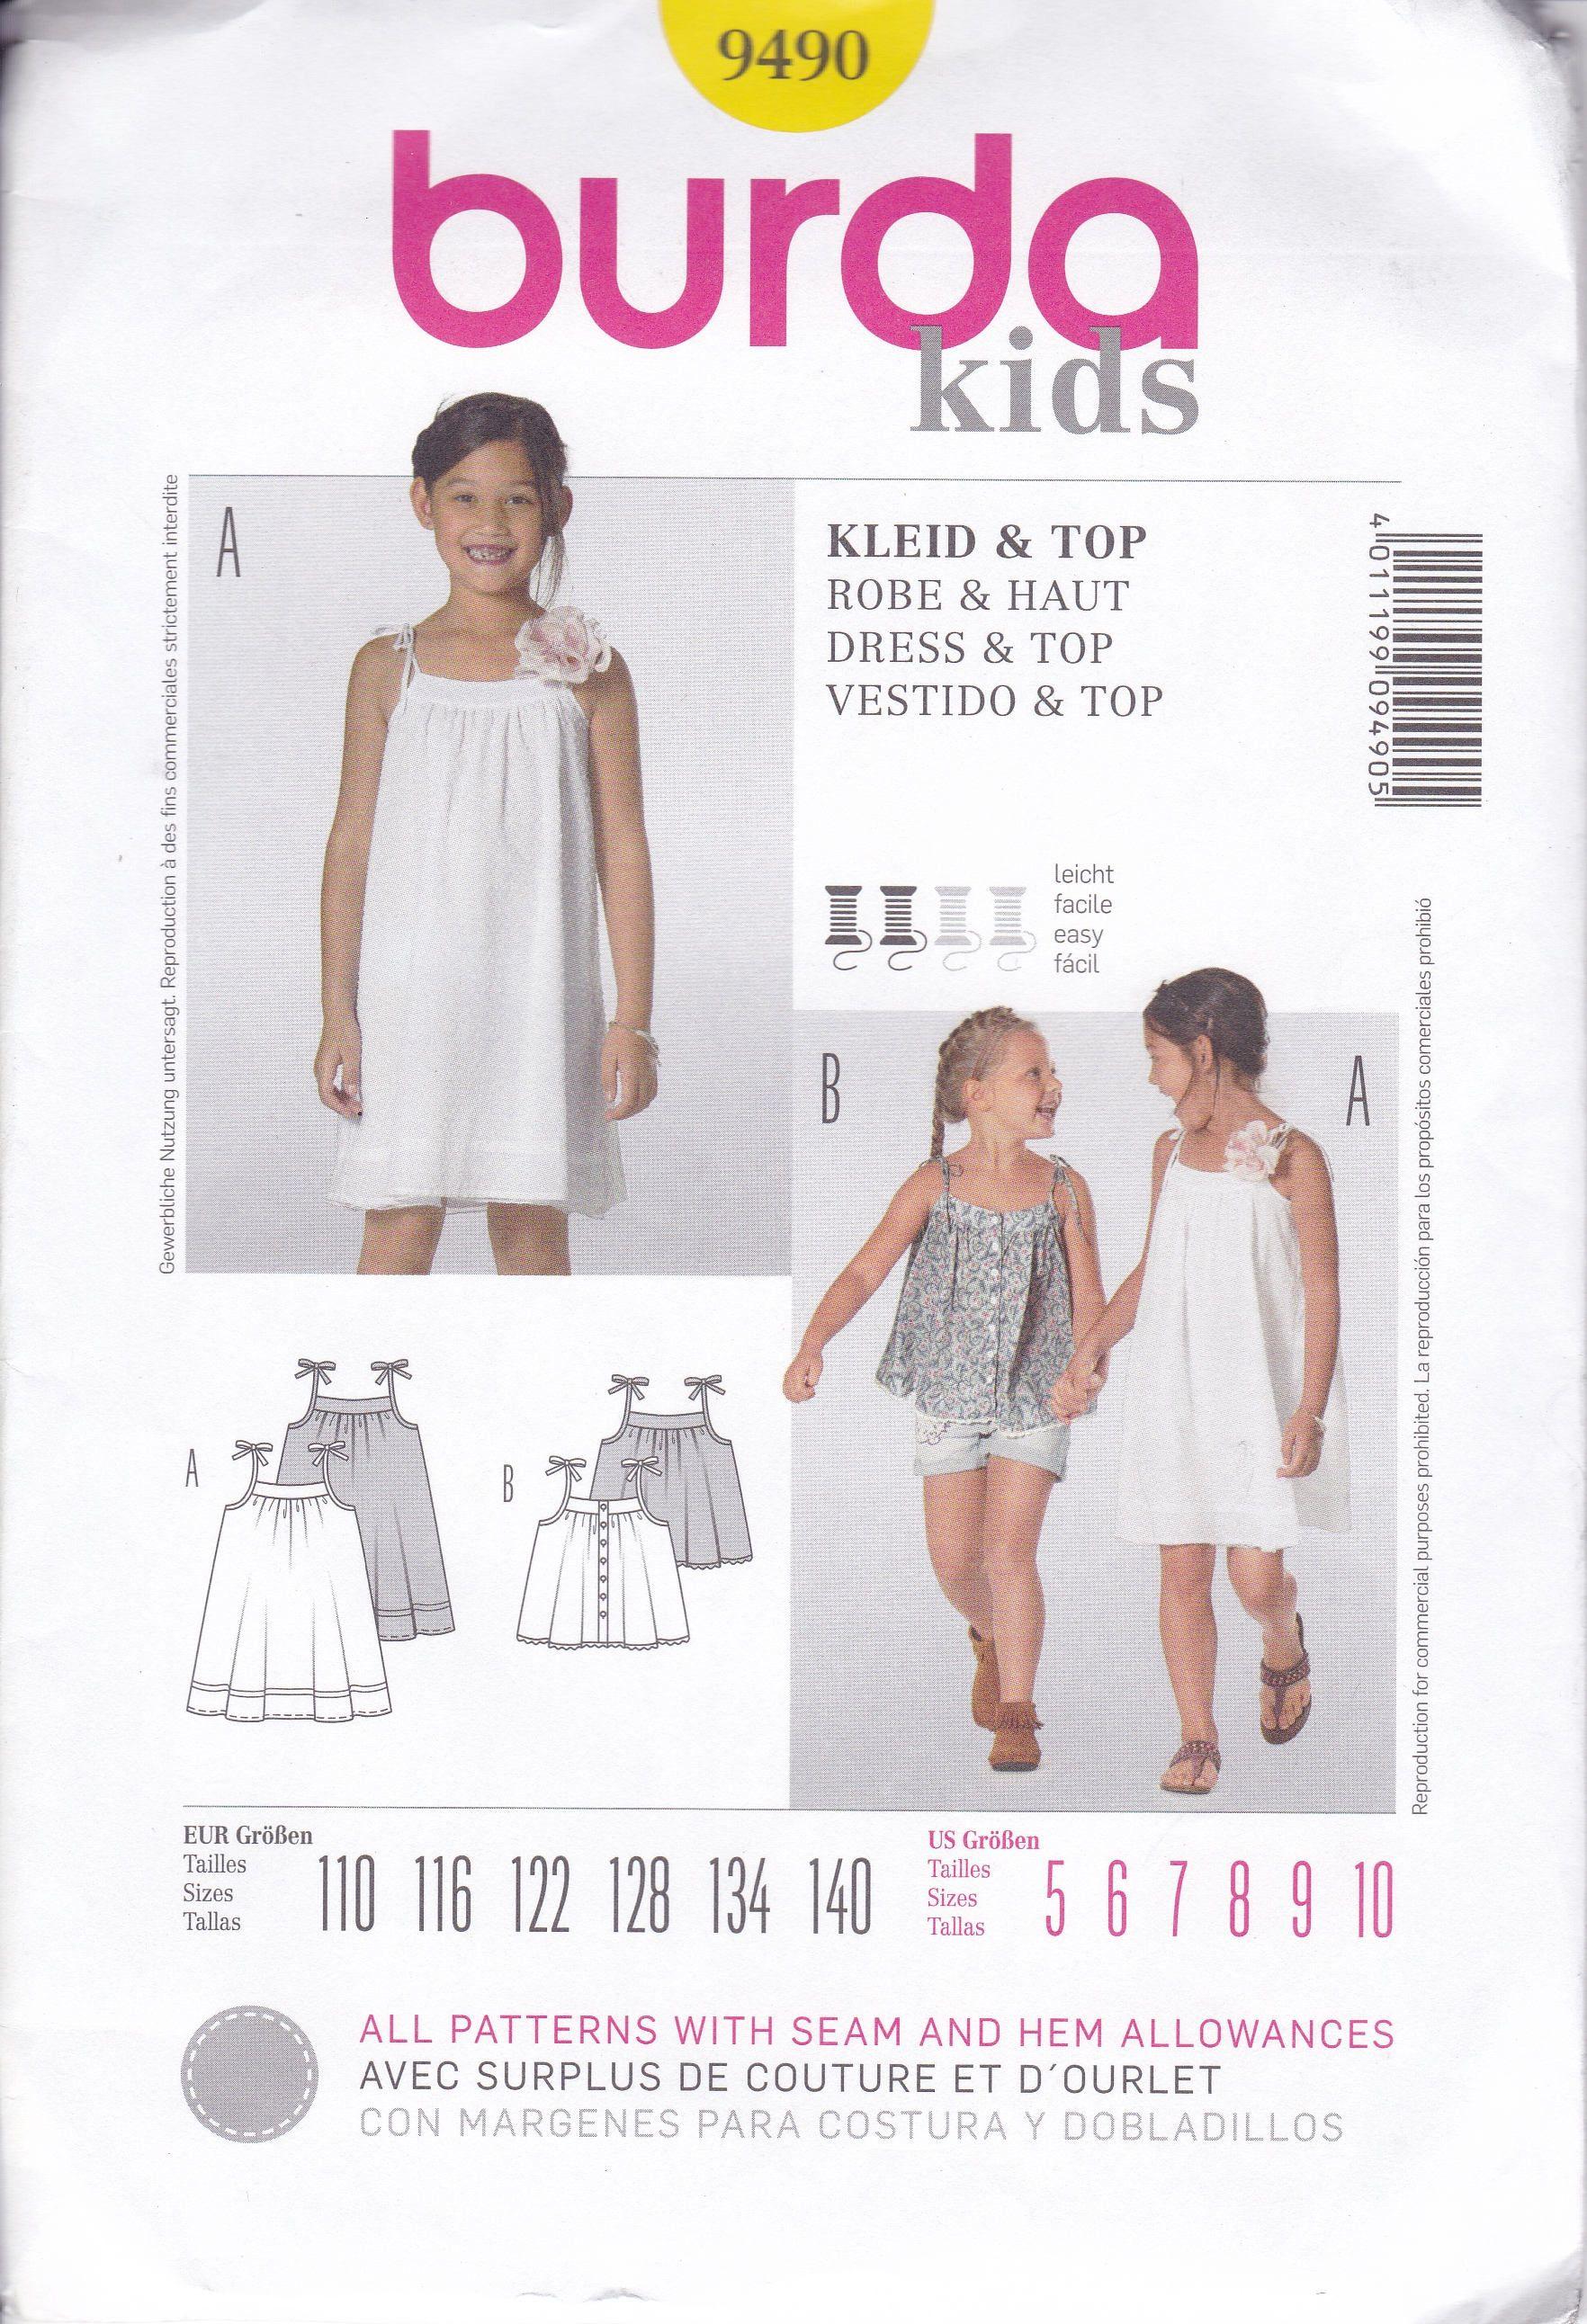 0d0376090cf1 FREE US SHIP Burda Kids 9490 Sewing Pattern Girls Summer Dress Top Tie  Shoulders Uncut Size 4 6 7 8 9 10 New by LanetzLiving on Etsy